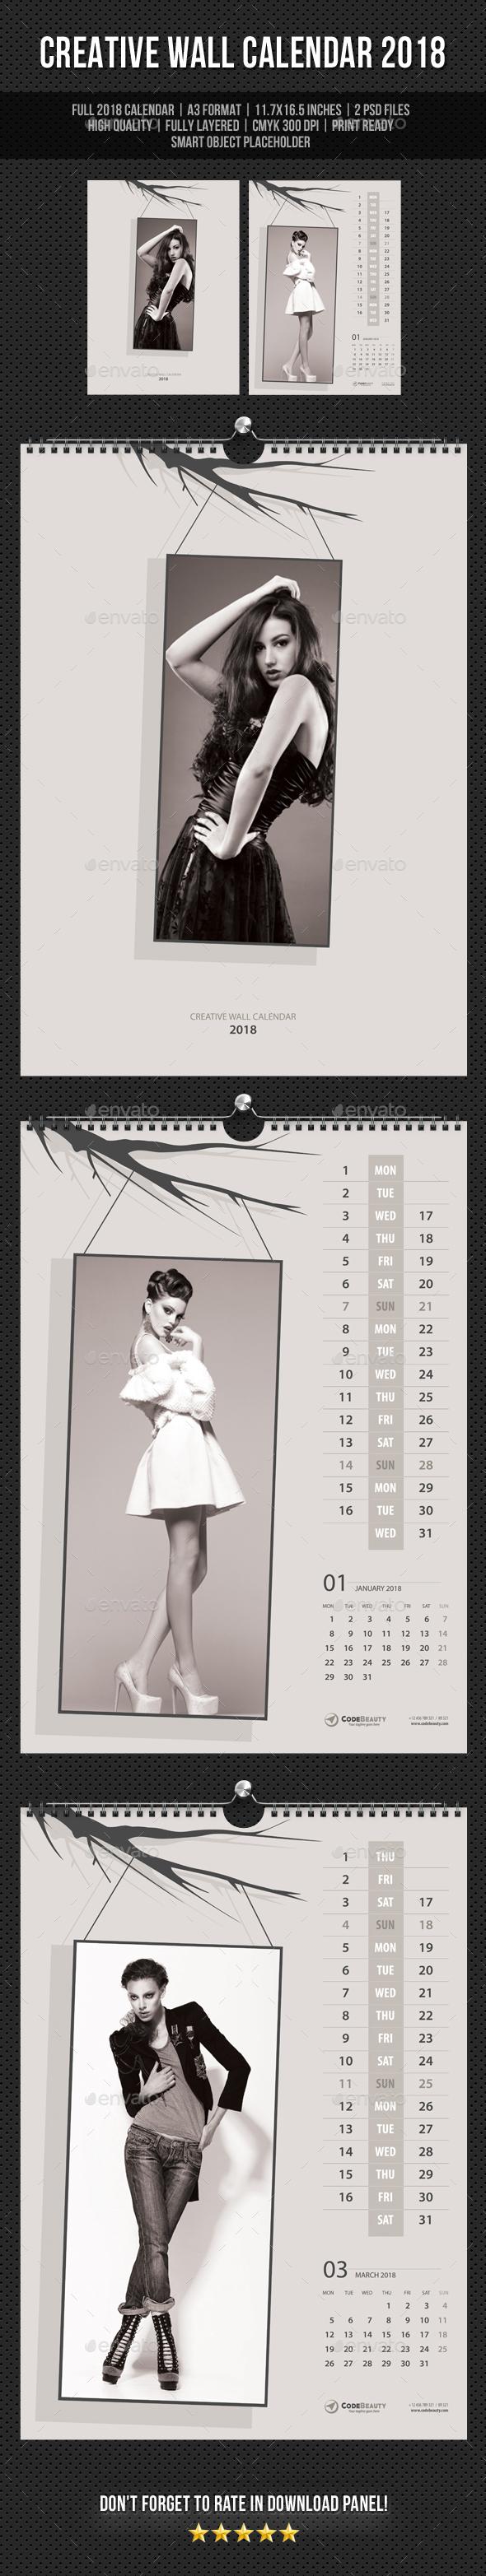 Creative Wall Calendar 2018 V17